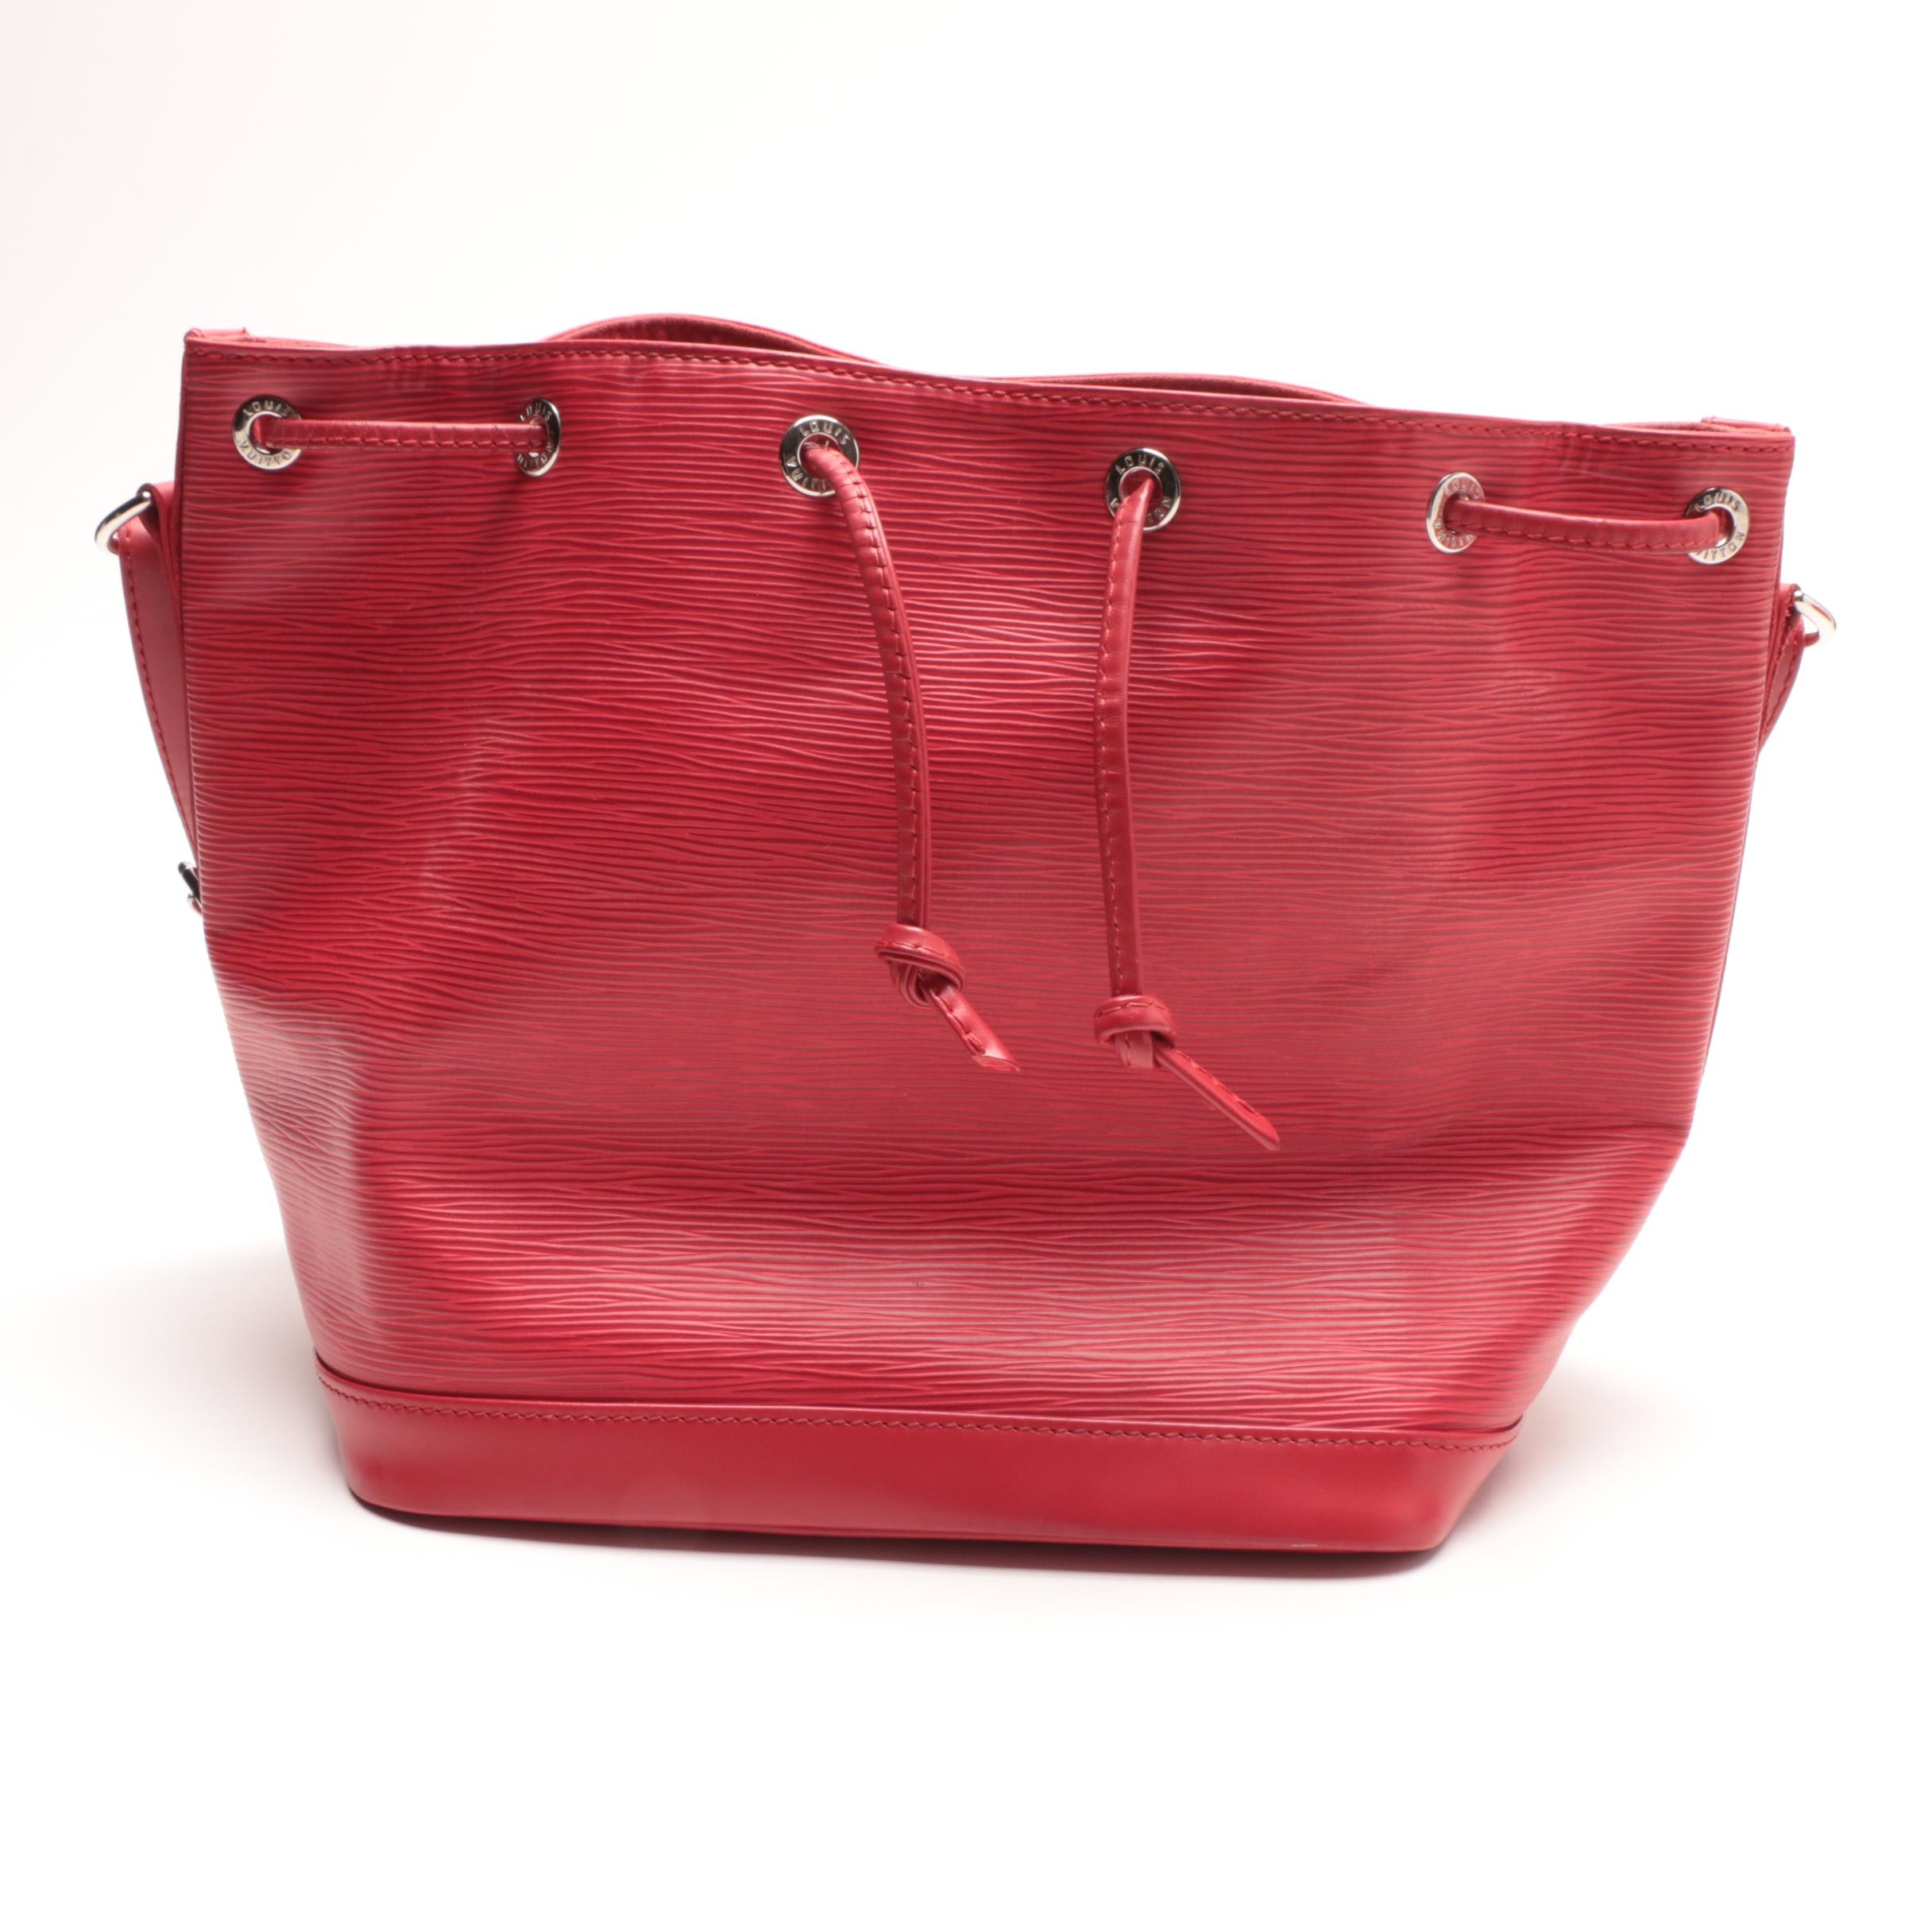 Louis Vuitton of Paris Red Epi Leather Noe Bucket Bag